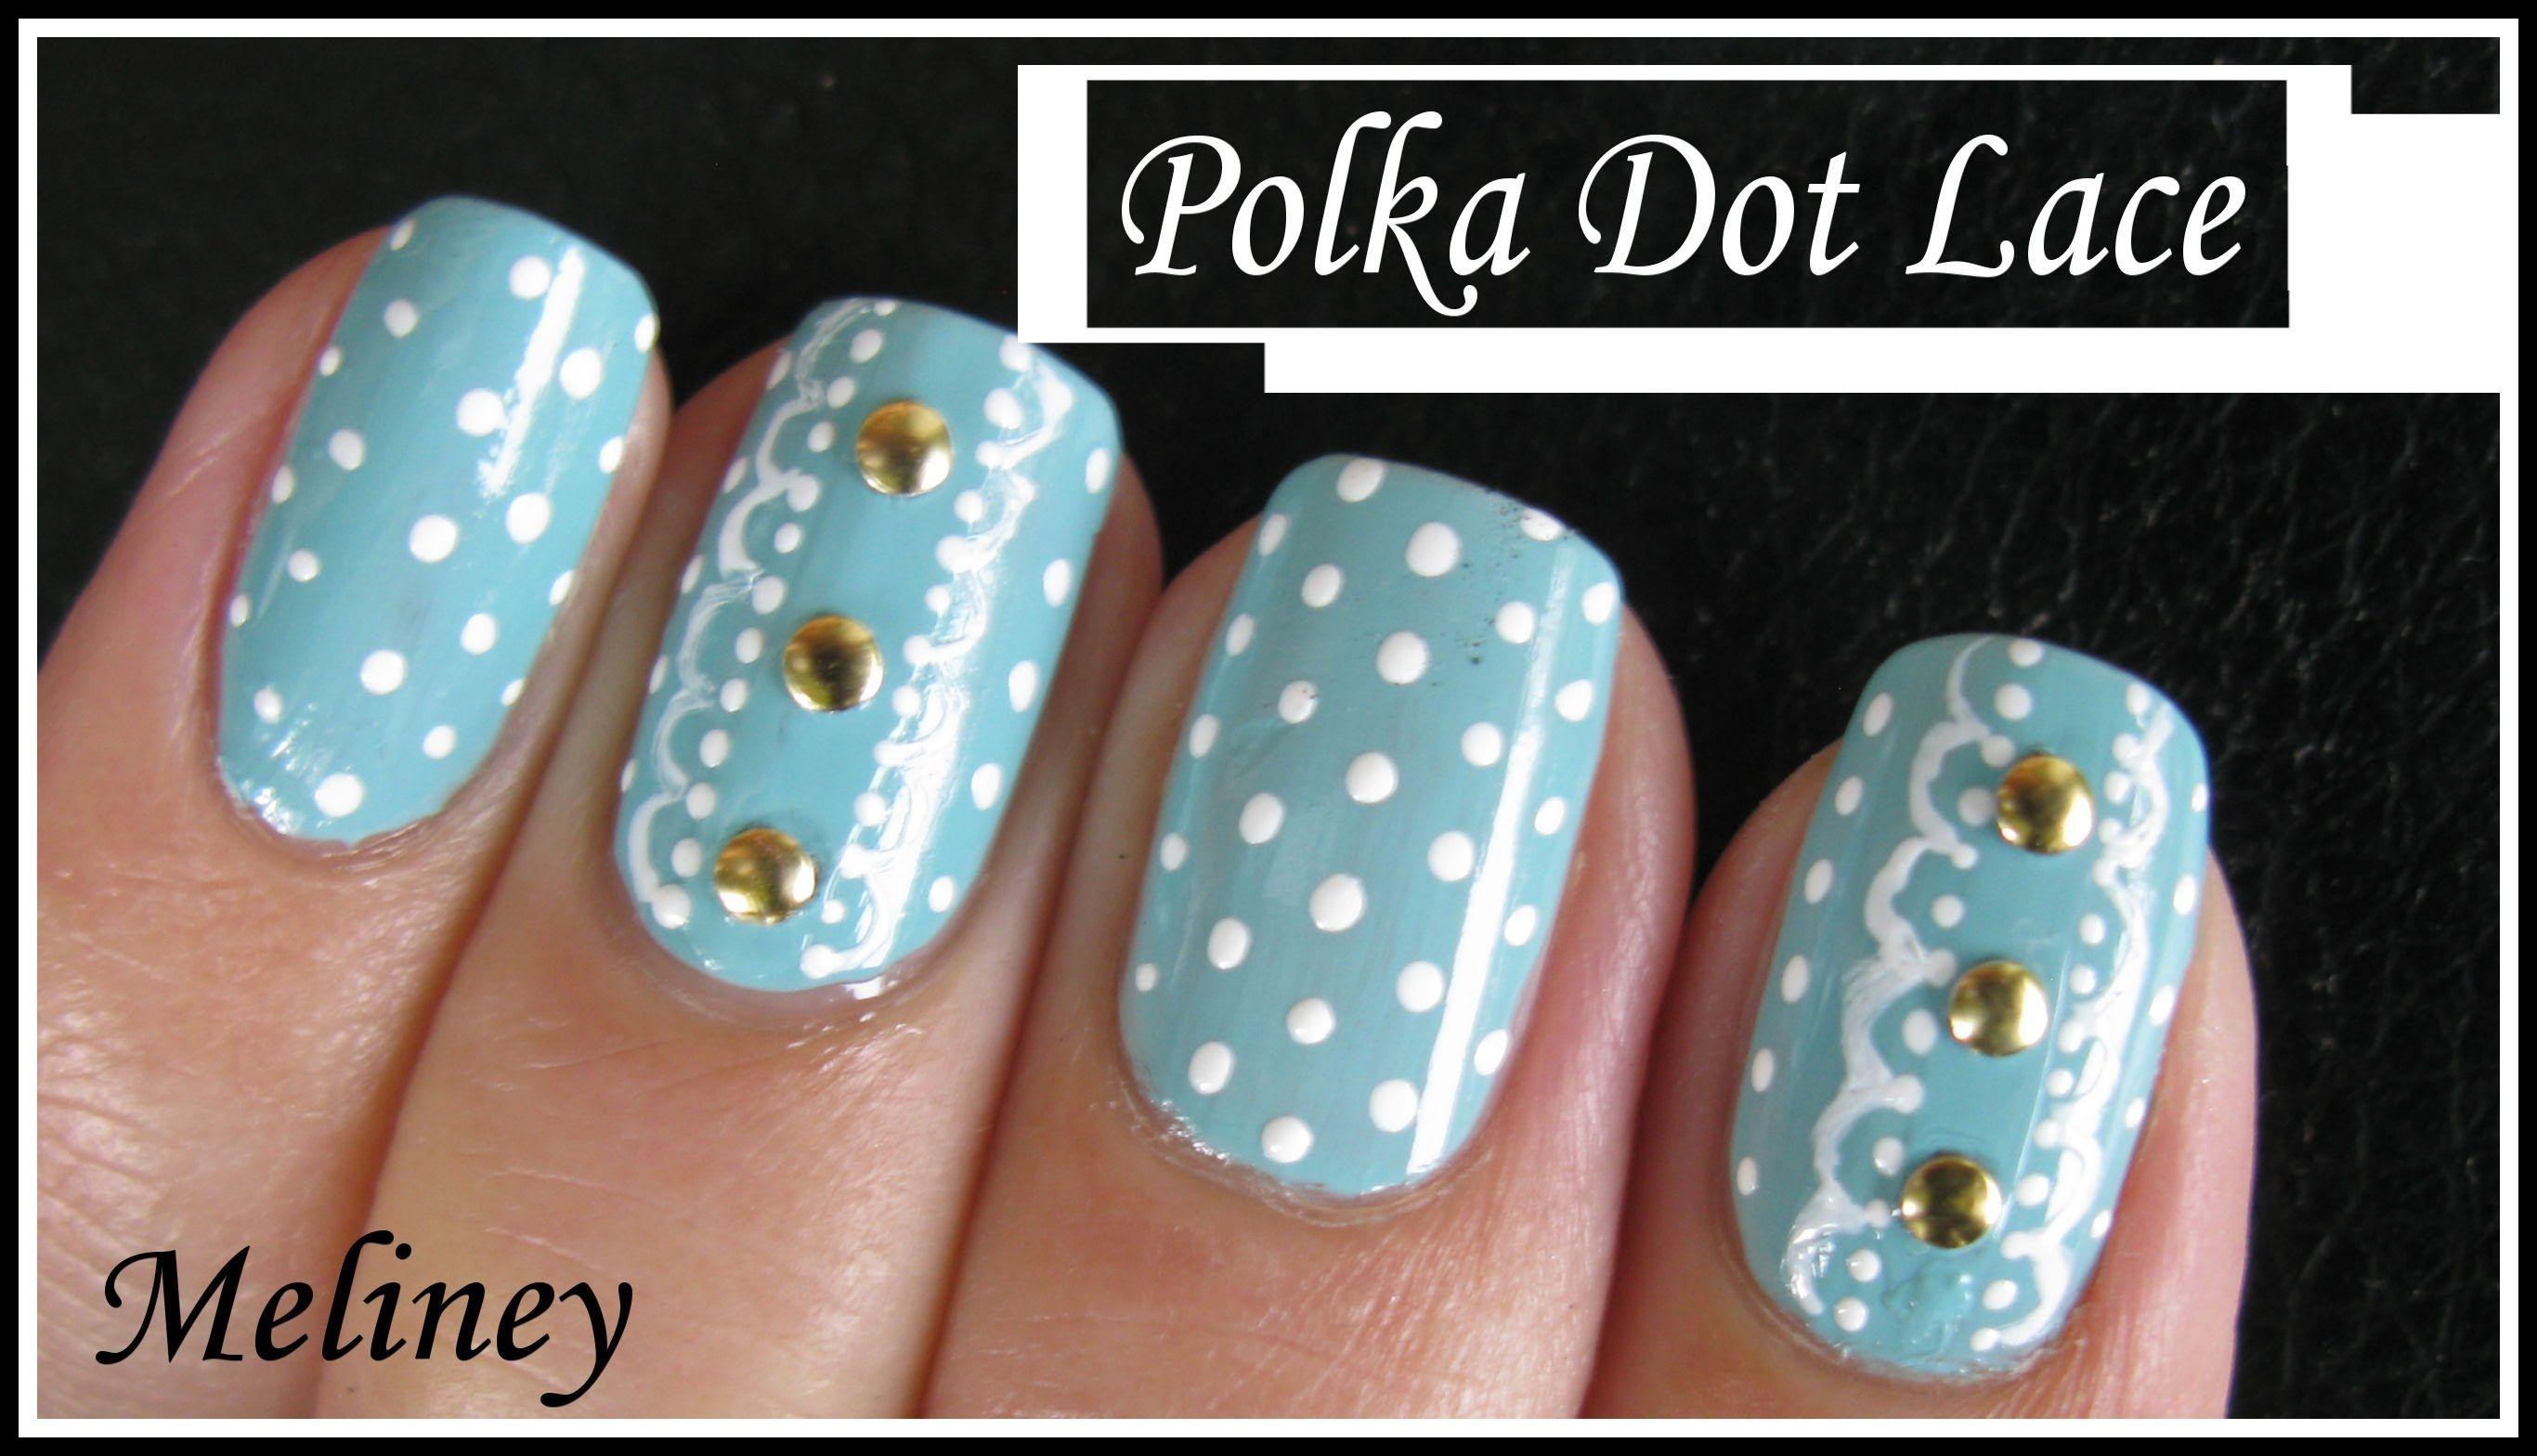 Polka Dot Lace Nail Art Design Retro Vintage Nail Tutorial